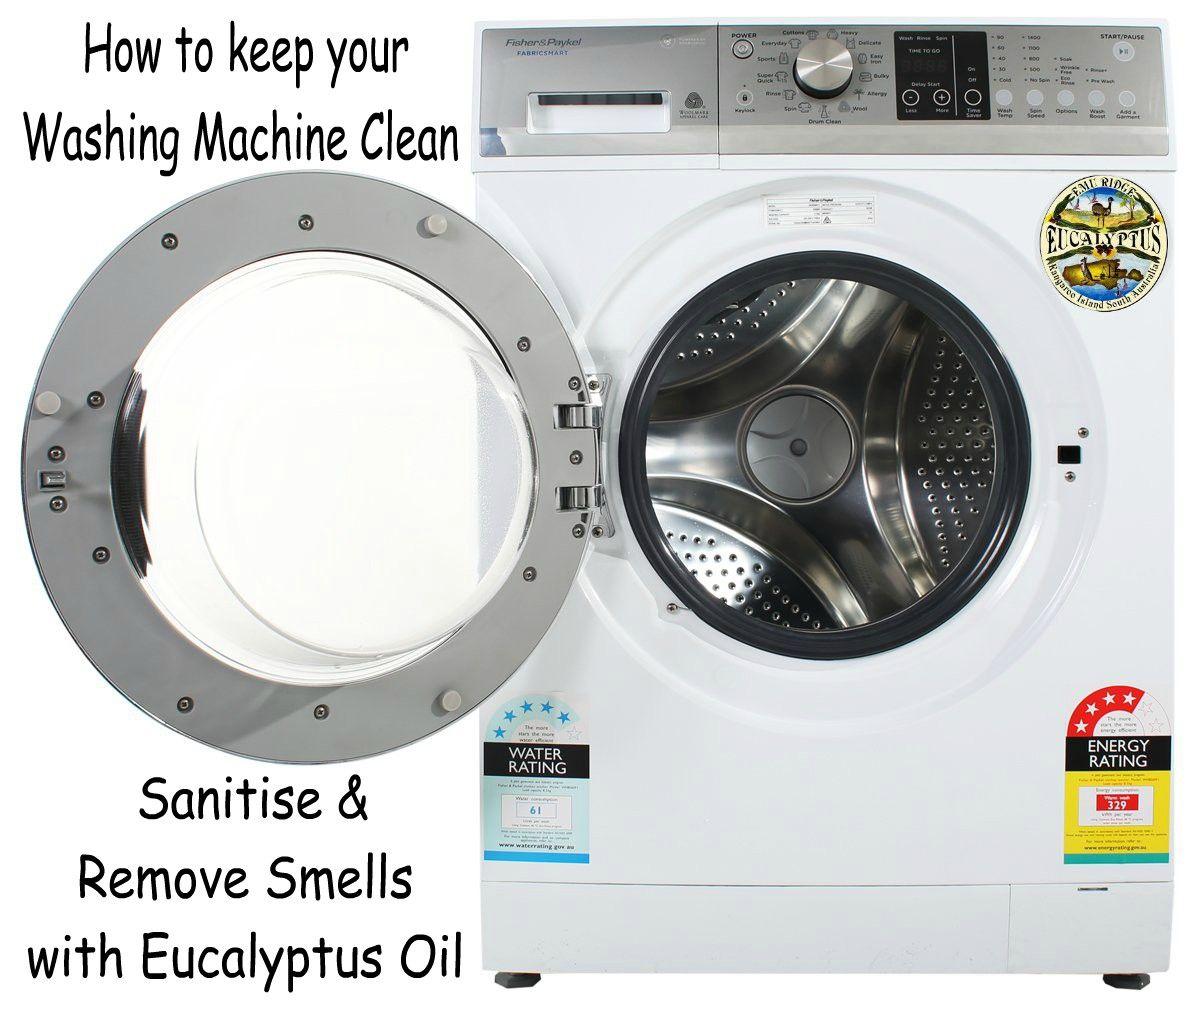 Cleaning your washing machine with Eucalyptus | Emu Ridge ...